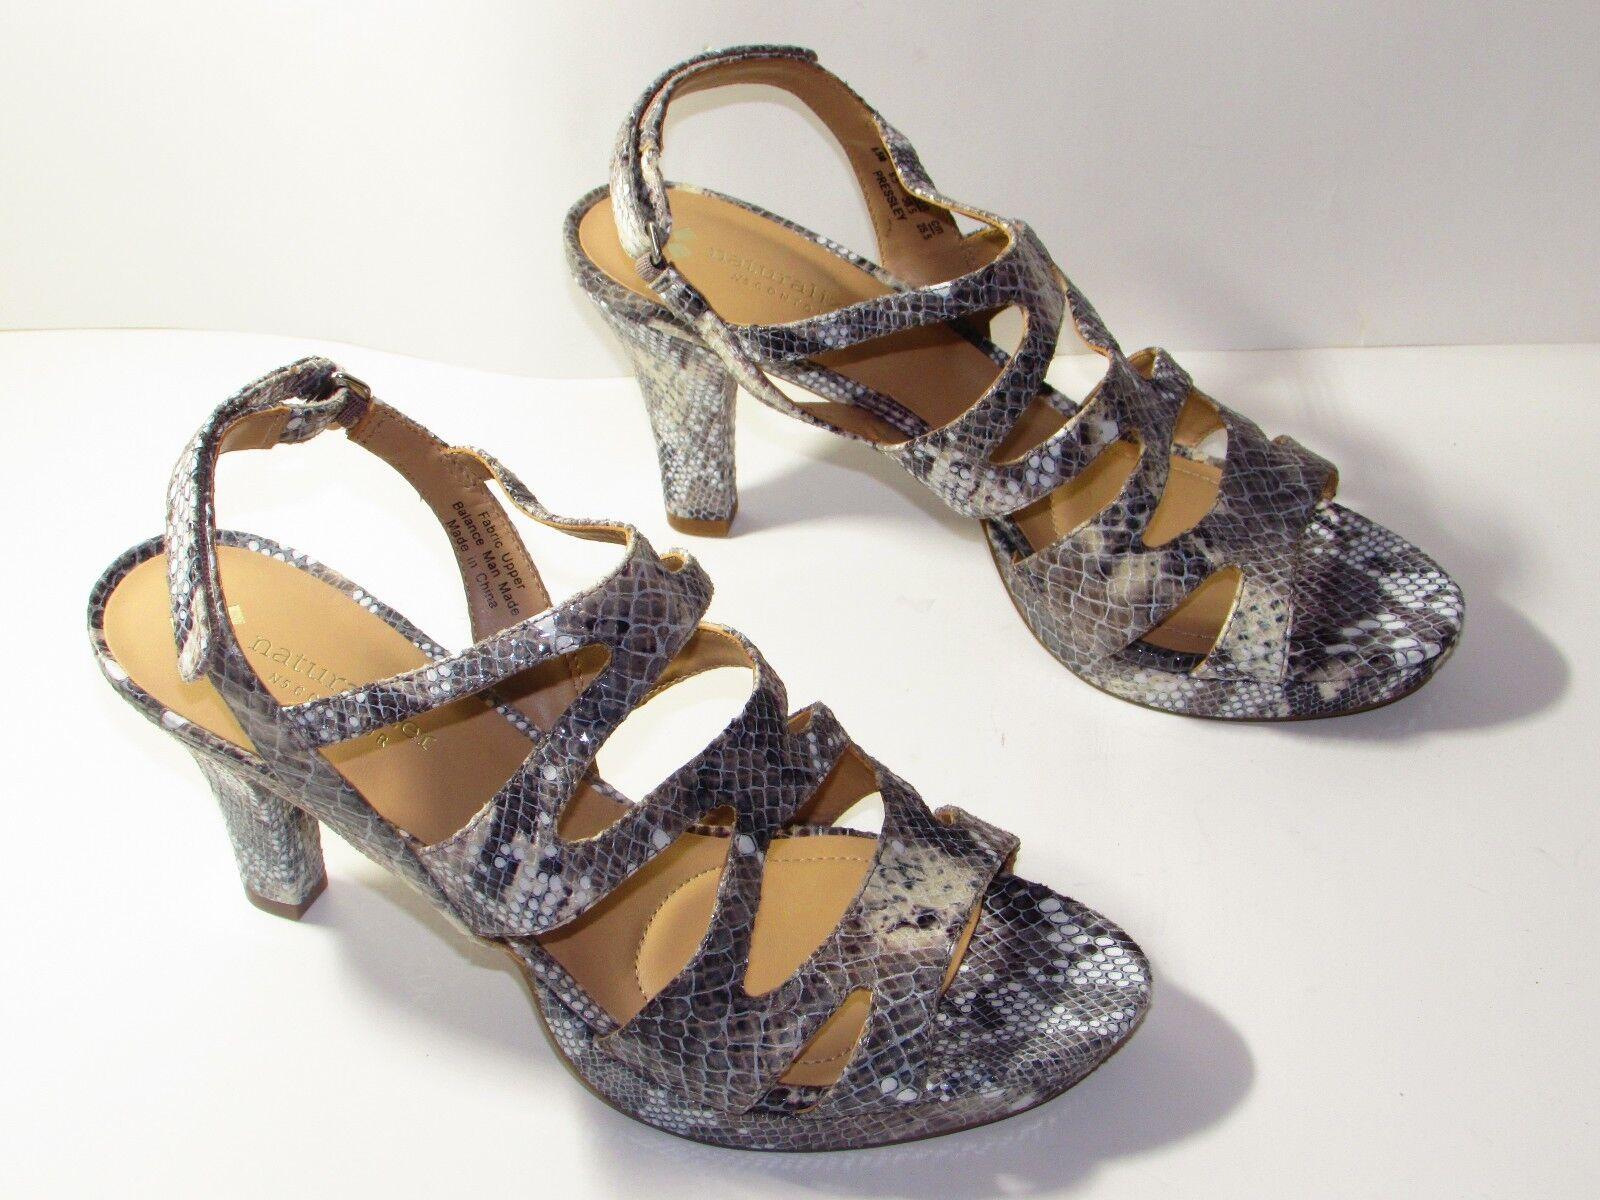 Naturalizer Women's Open Toe Heels in Grey Snake Size Us 8.5 M   Uk 6.5  Eu 38.5